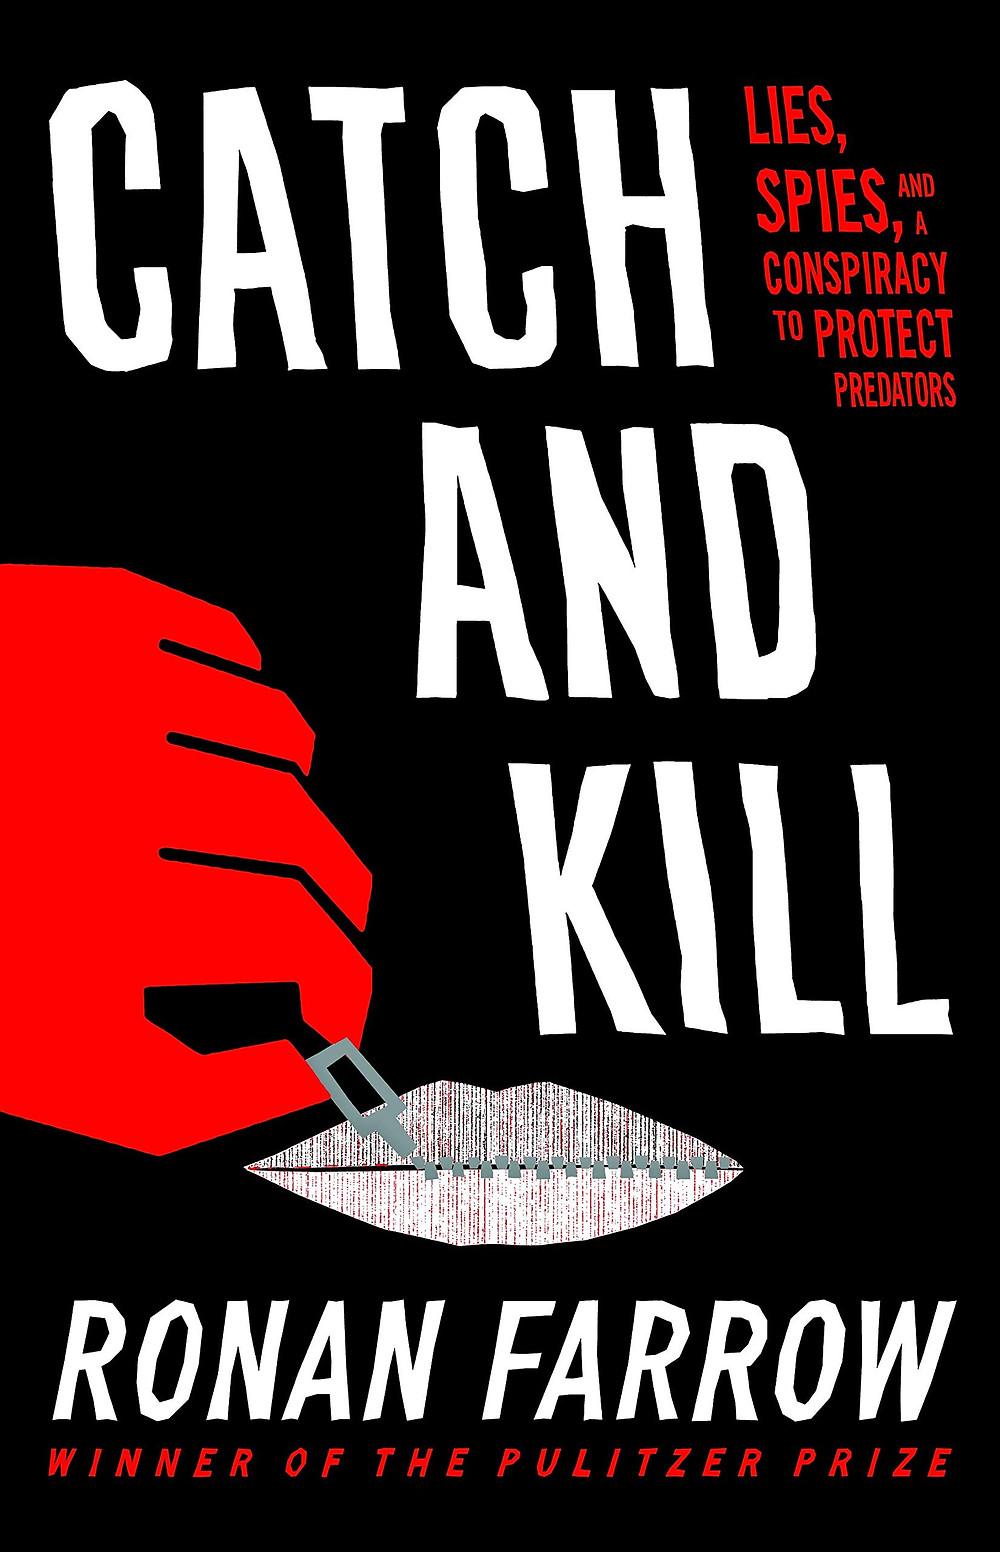 Catch & Kill: Lies, Spies, & a Conspiracy to Protect Predators by Ronan Farrow